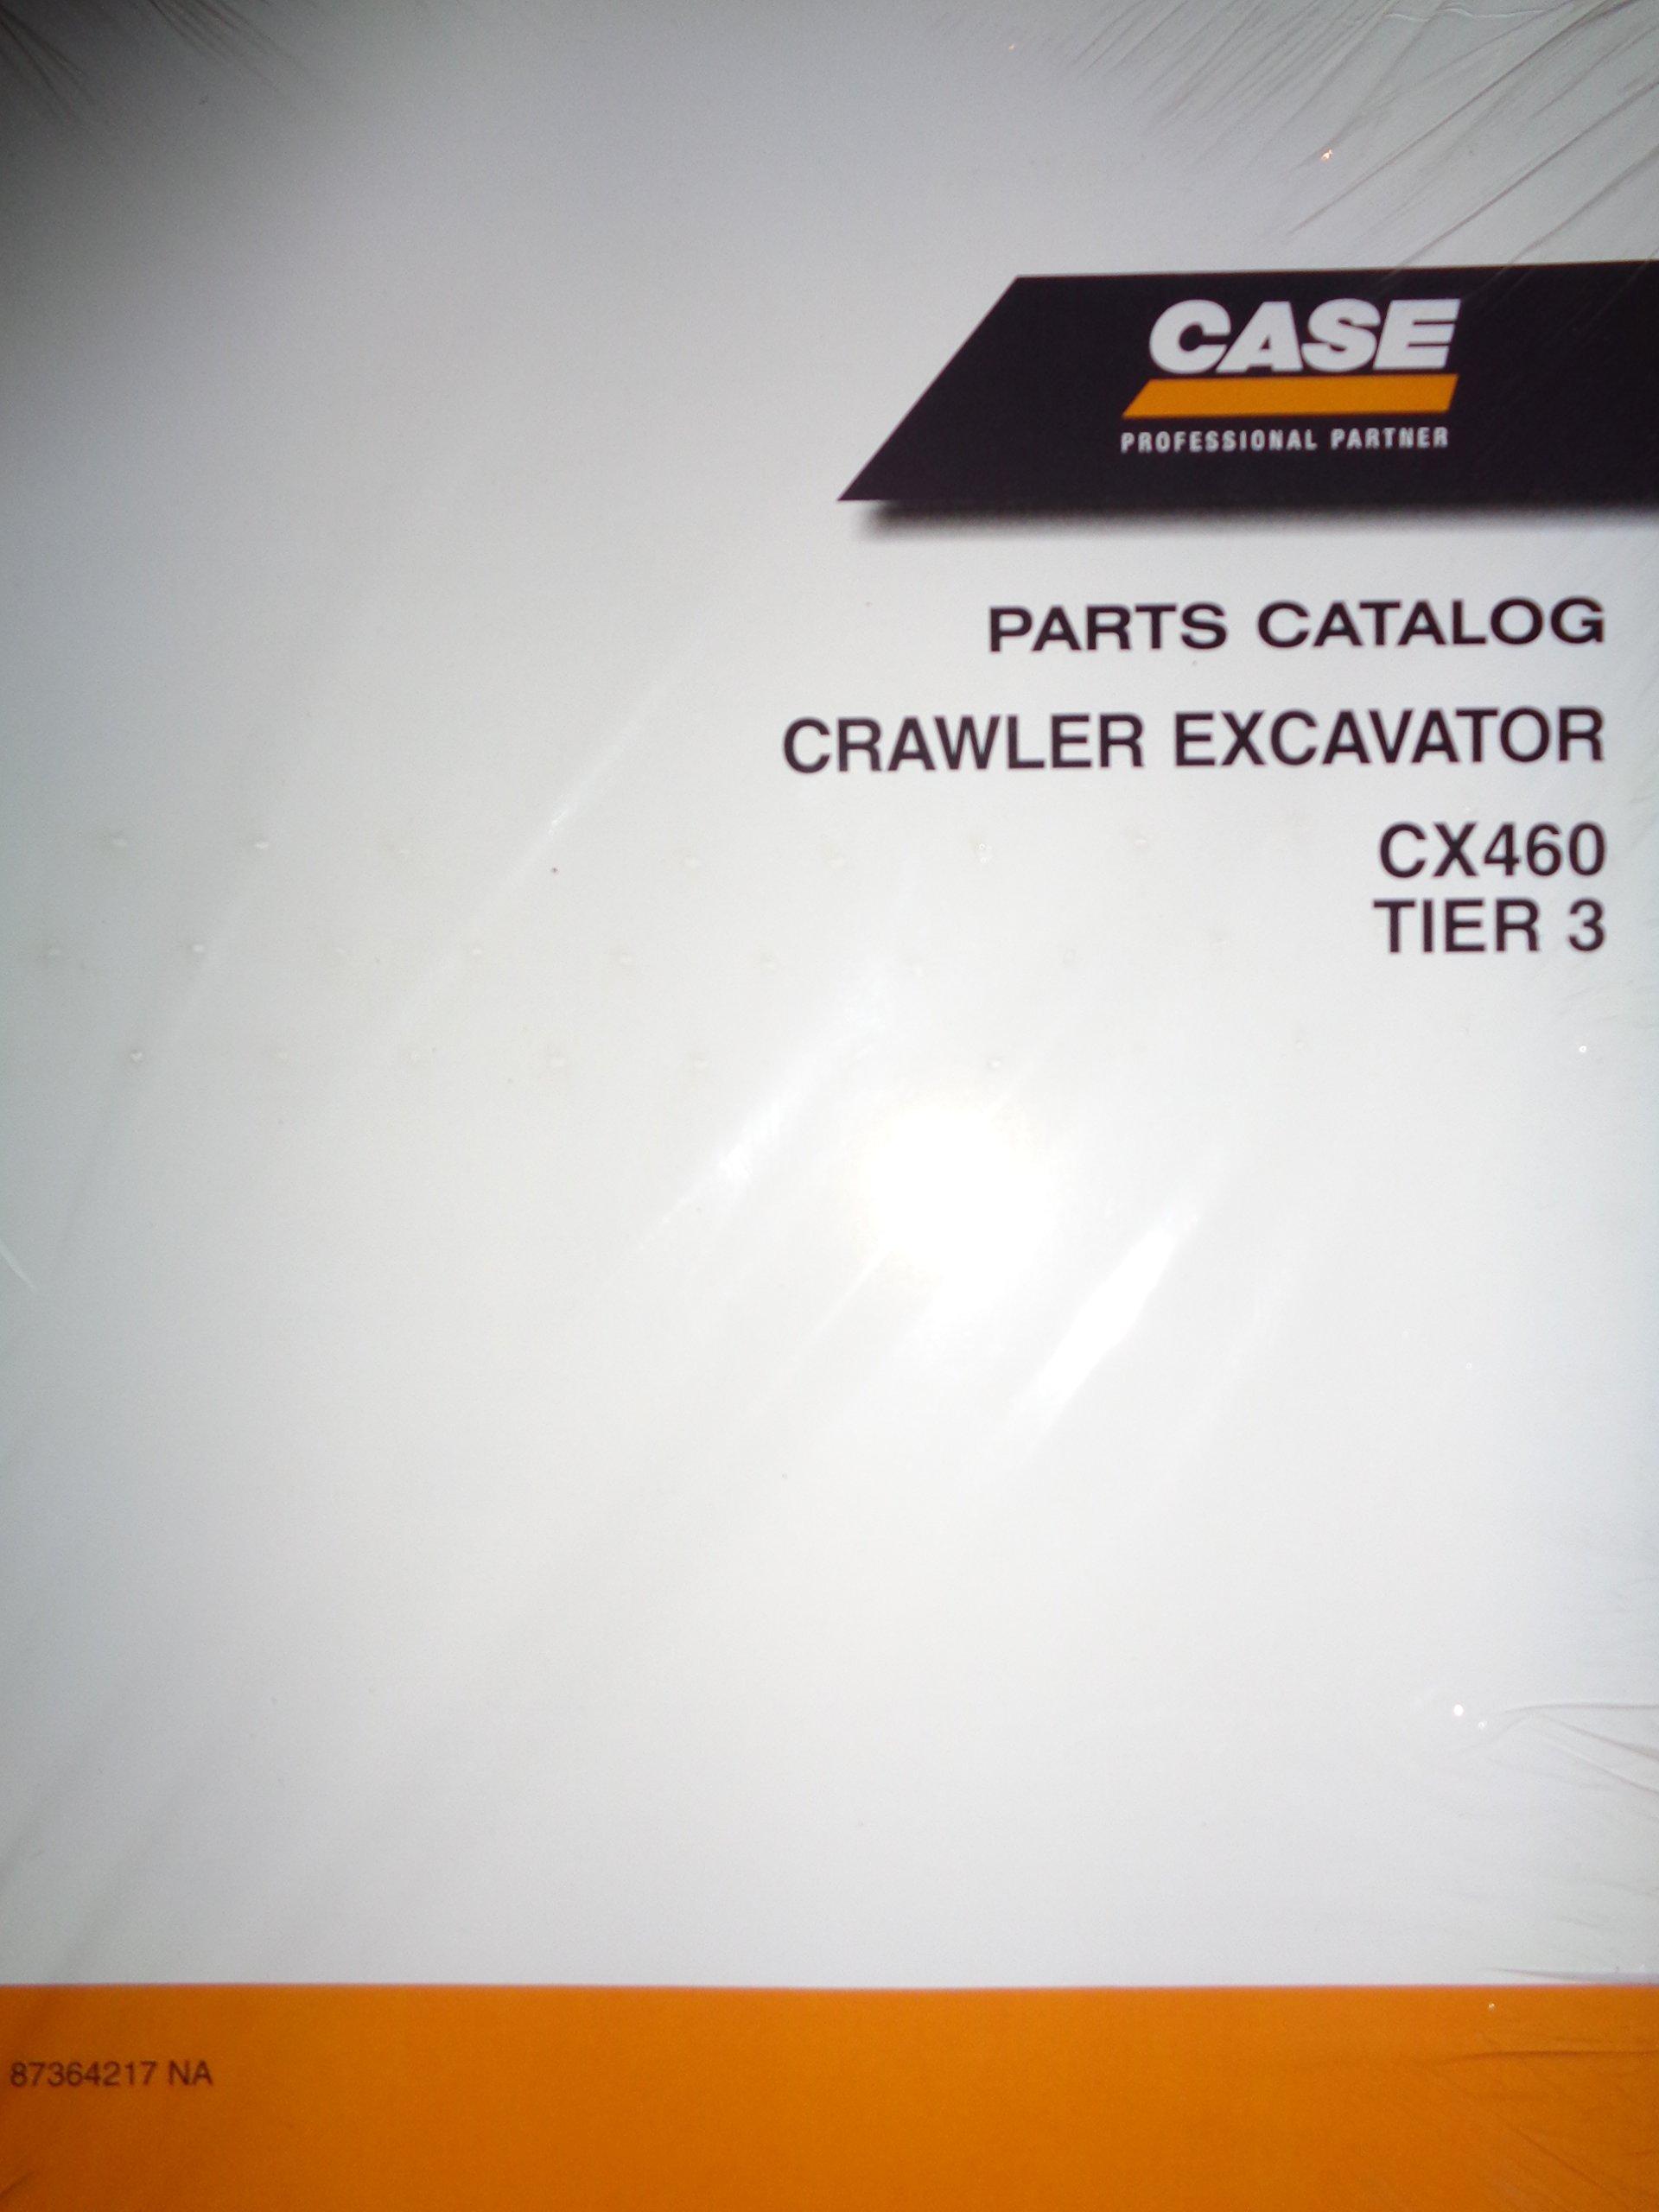 Case CX460 Tier 3 Crawler Excavator Parts Catalog Book Manual